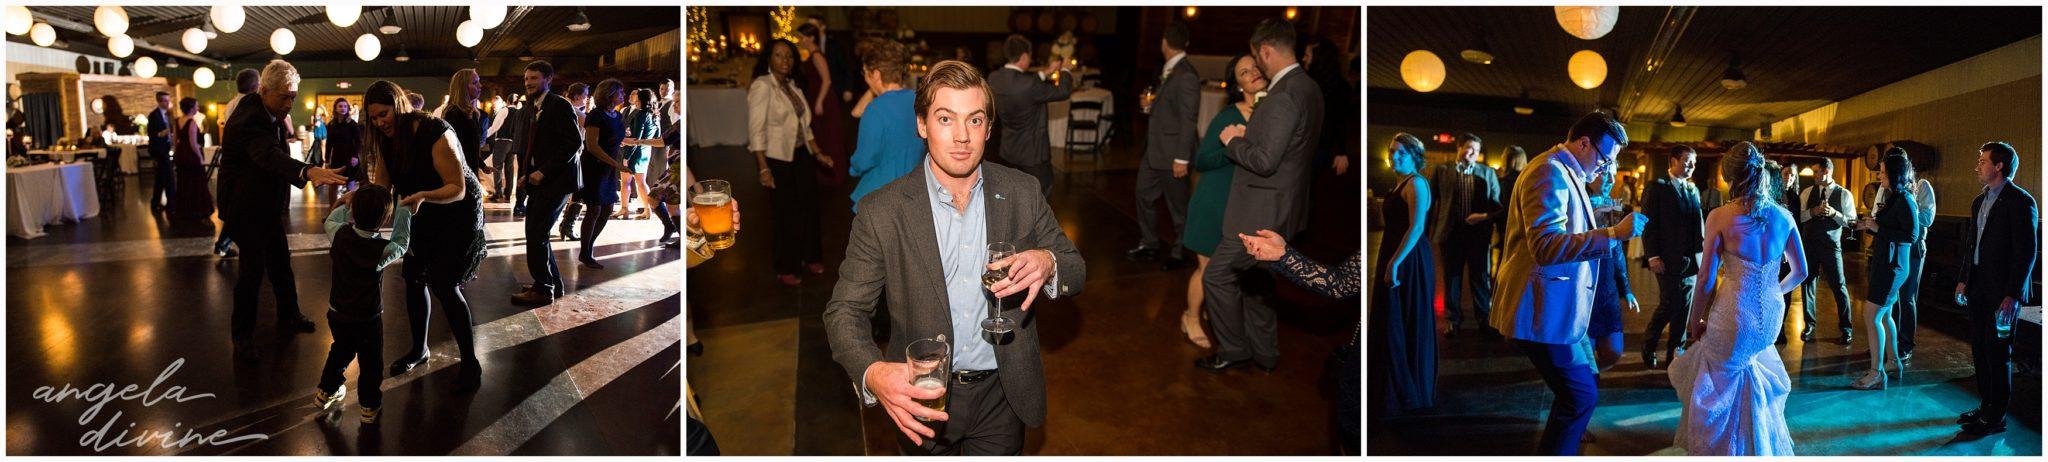 Carlos Creek Winery wedding dance floor